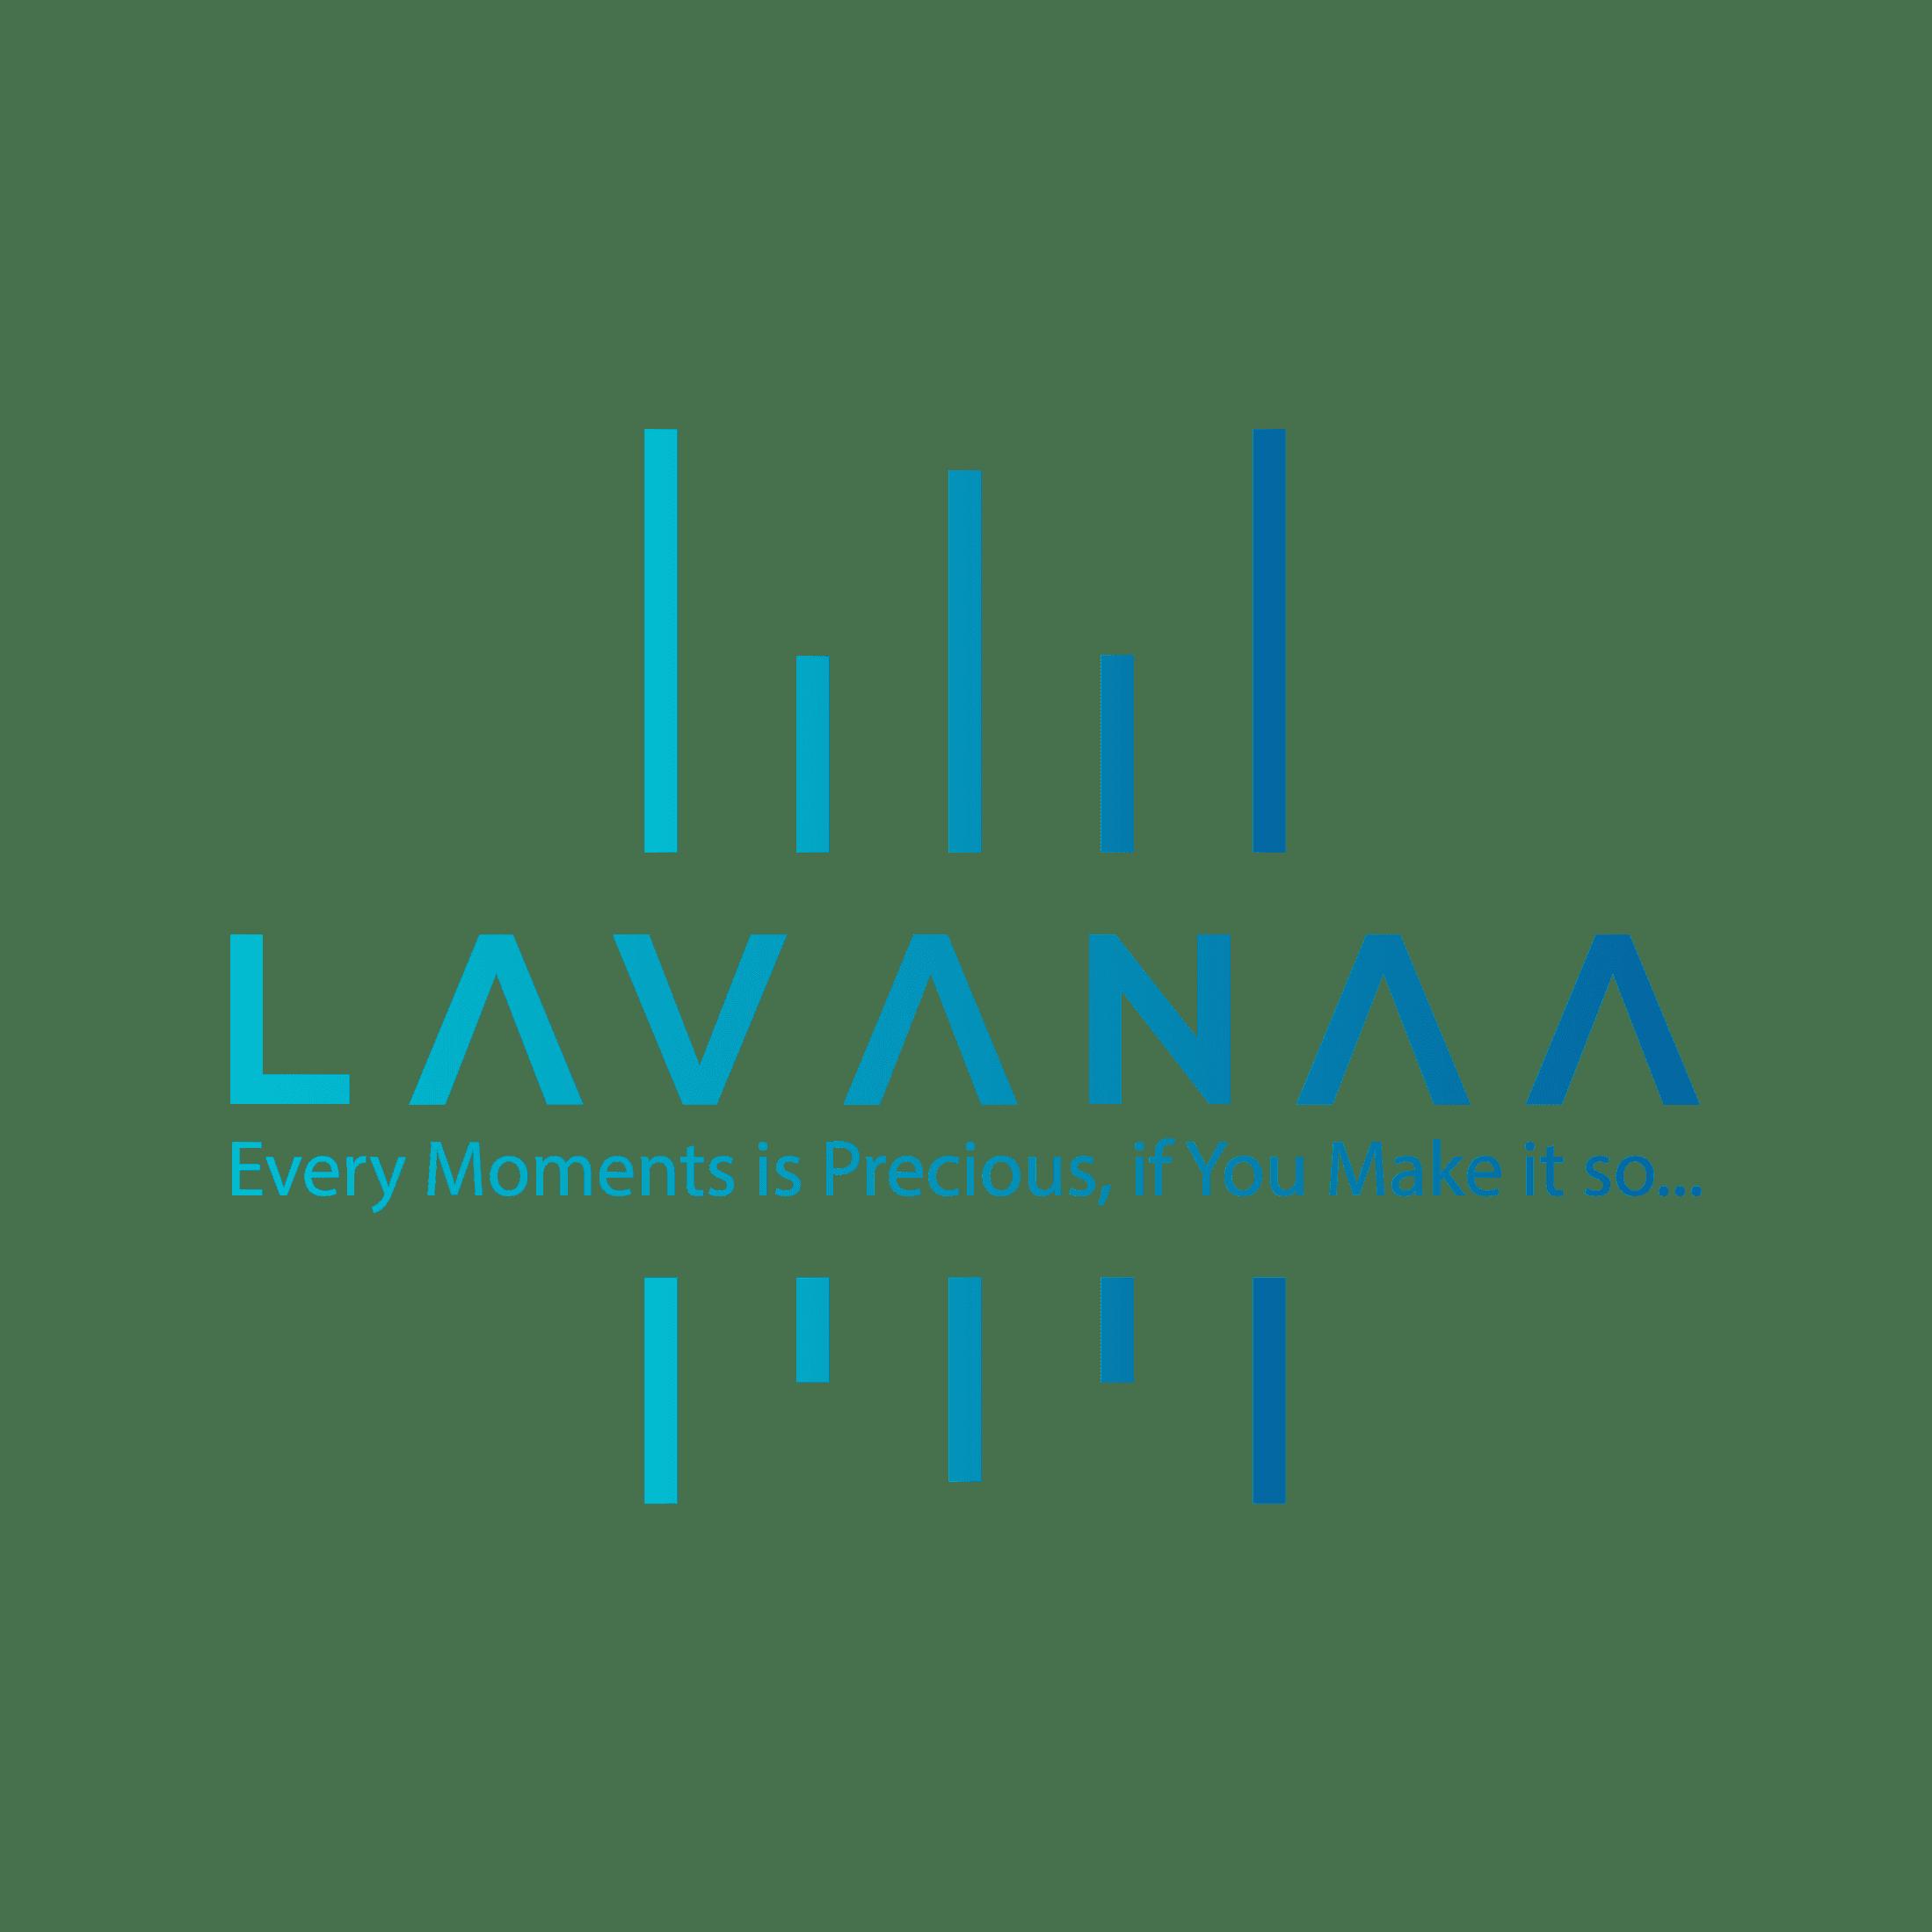 Lavanaa